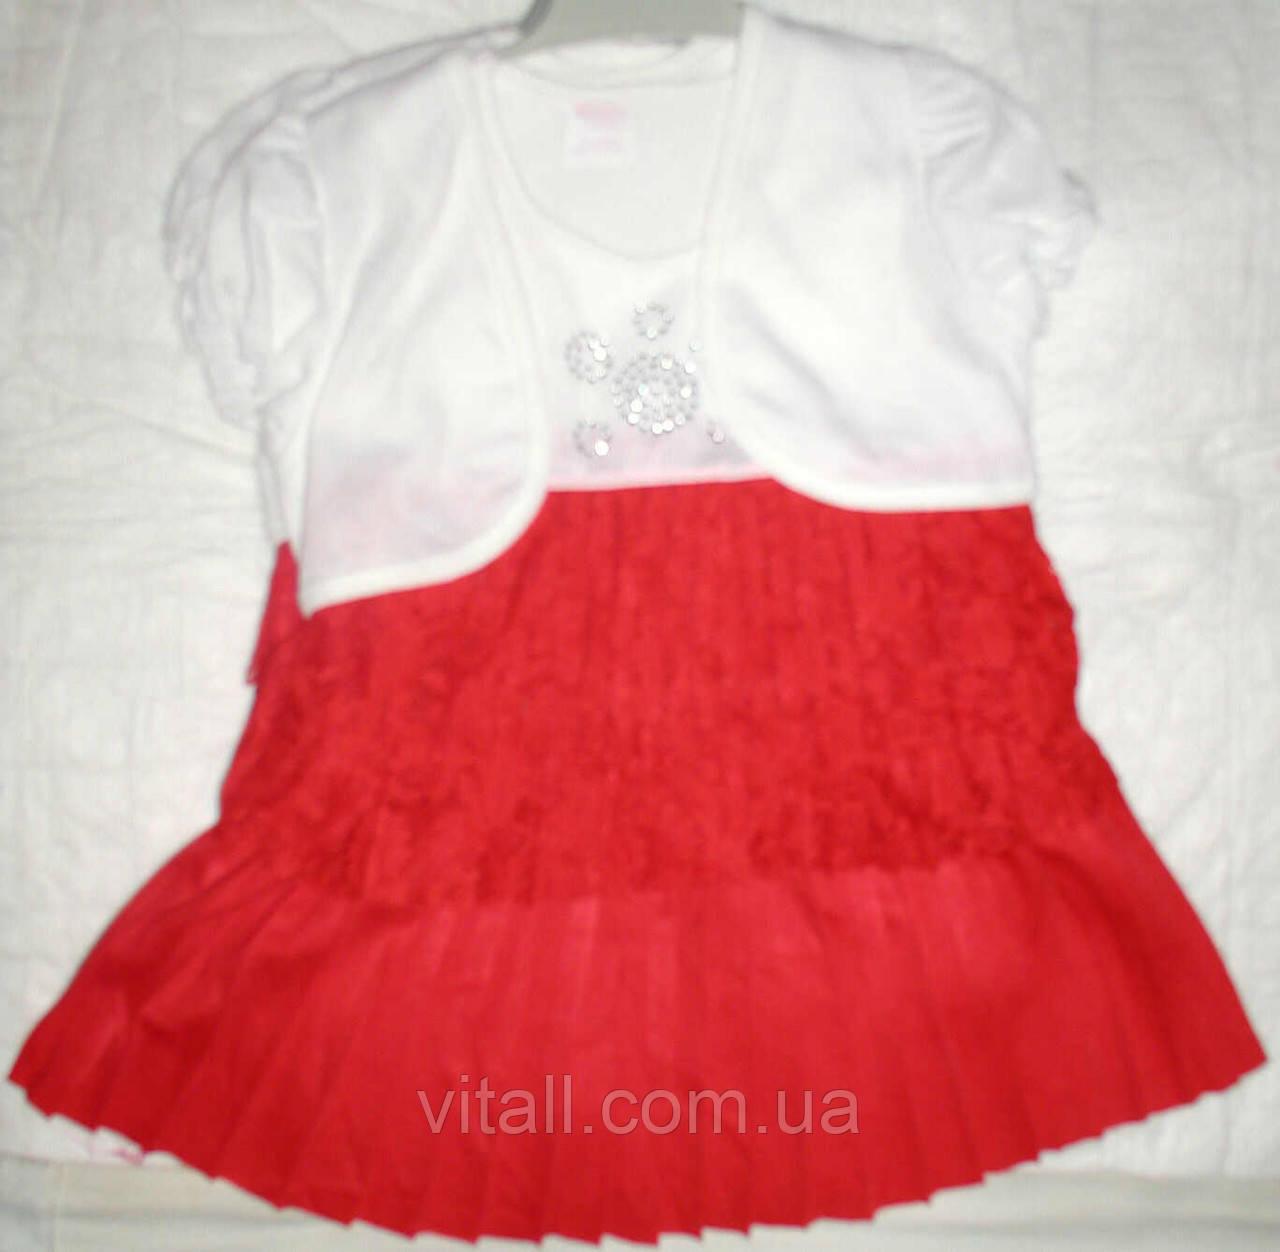 Платье гипюр плиссе1-3года корал